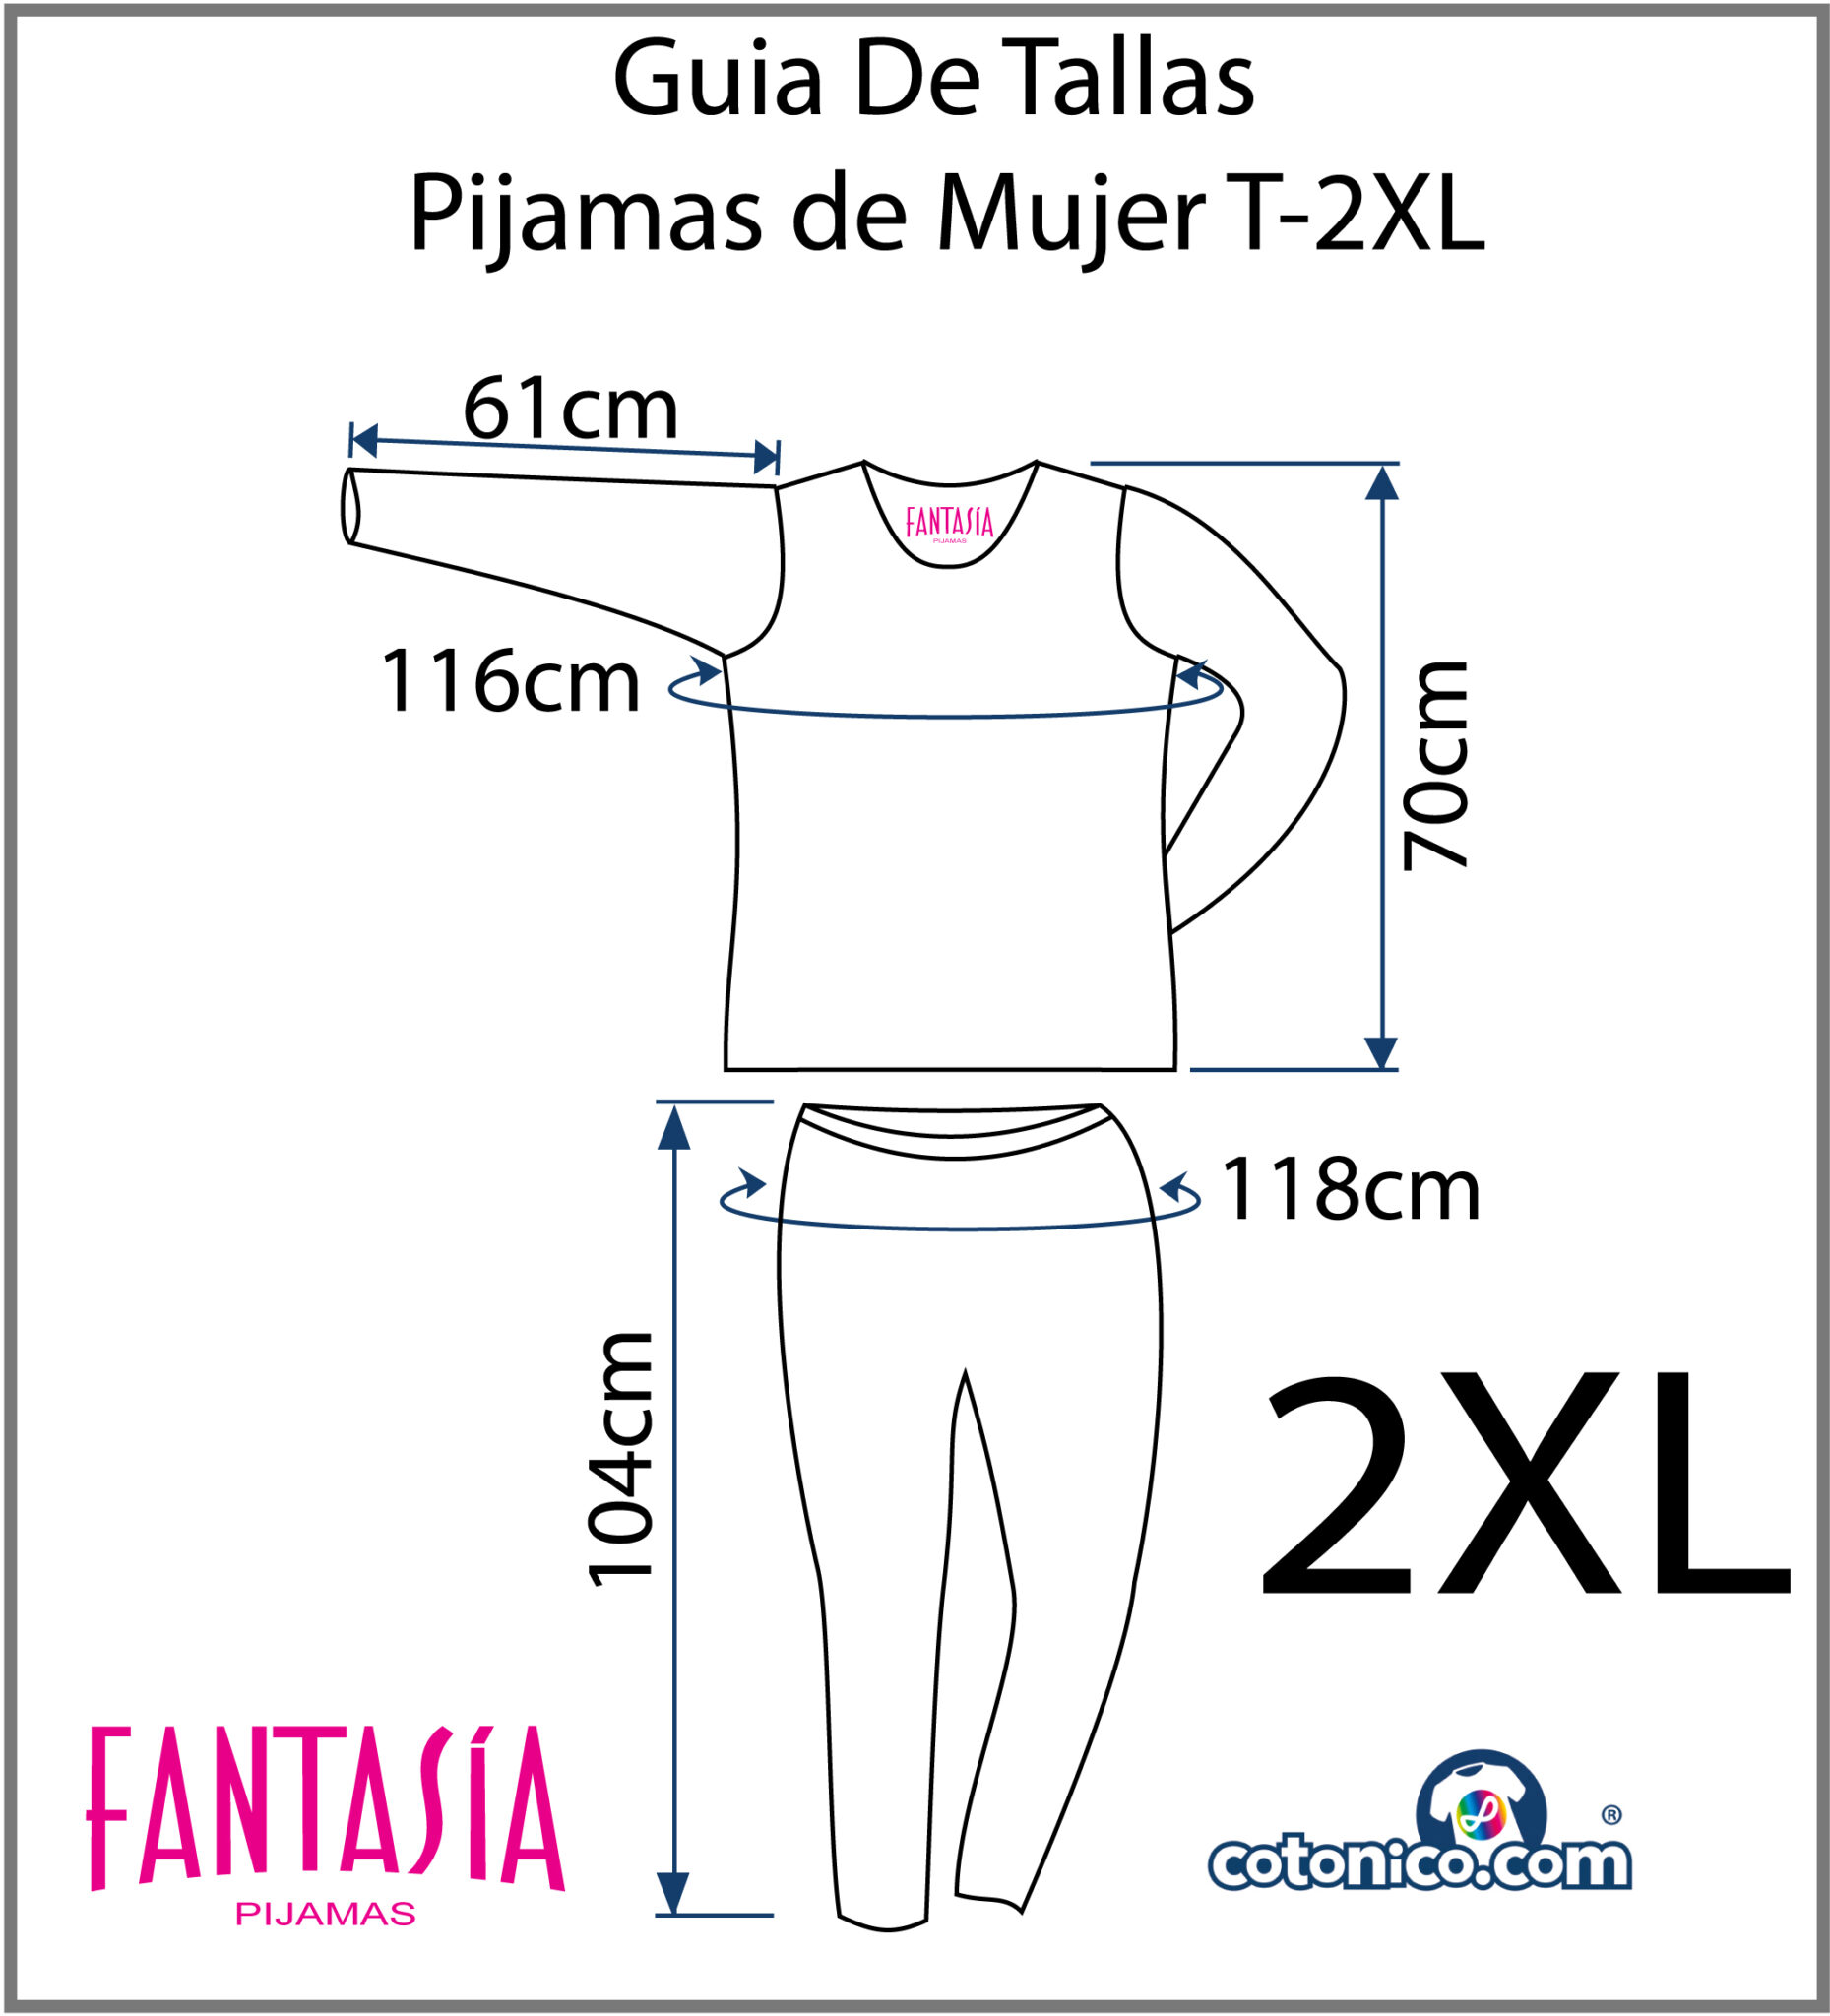 Guia-De-Tallas-Pijamas-De-Mujer-2XL